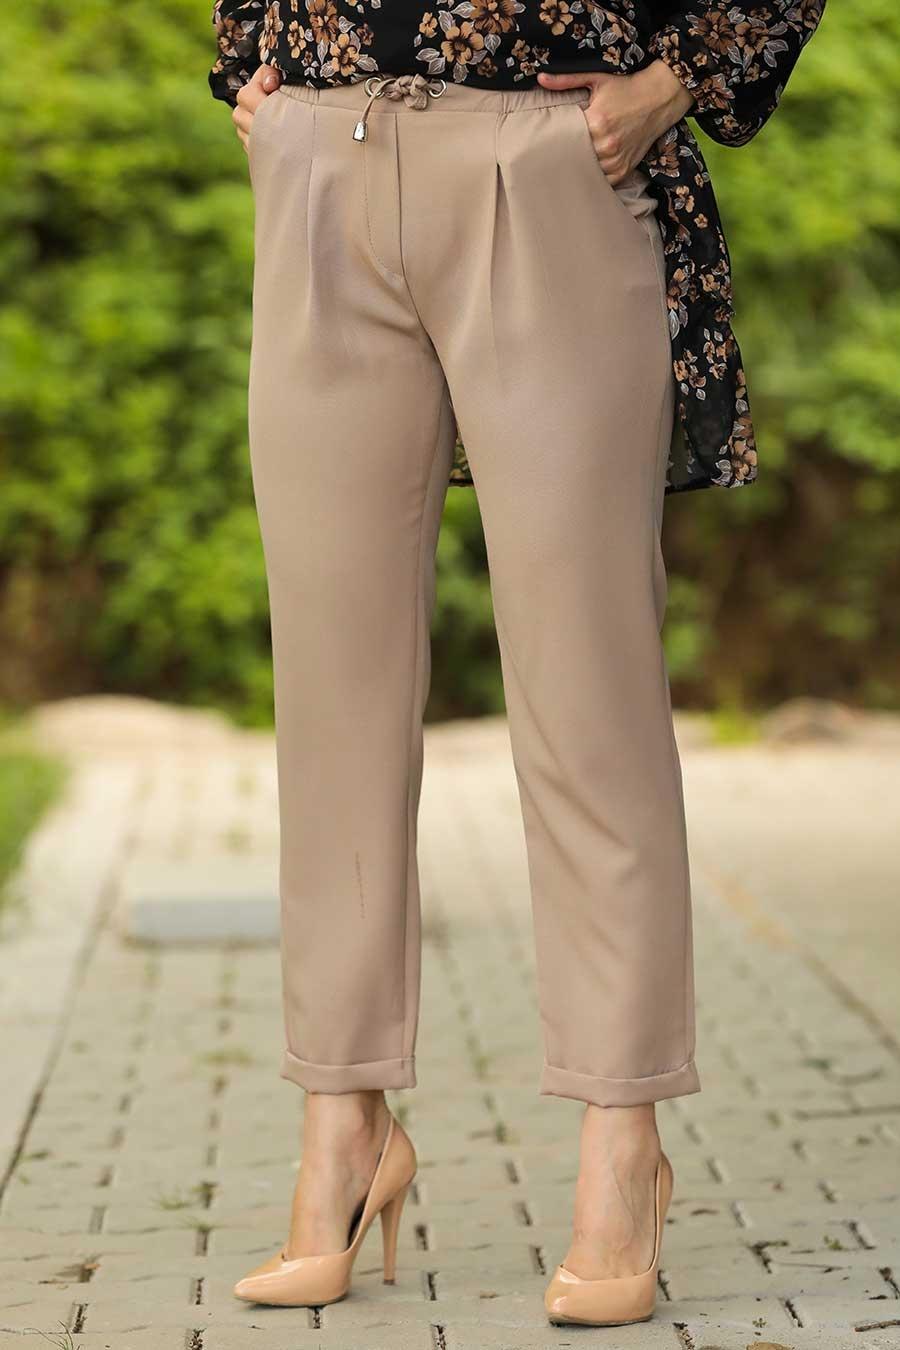 Neva Style - Vizon Tesettür Pantolon 10401V